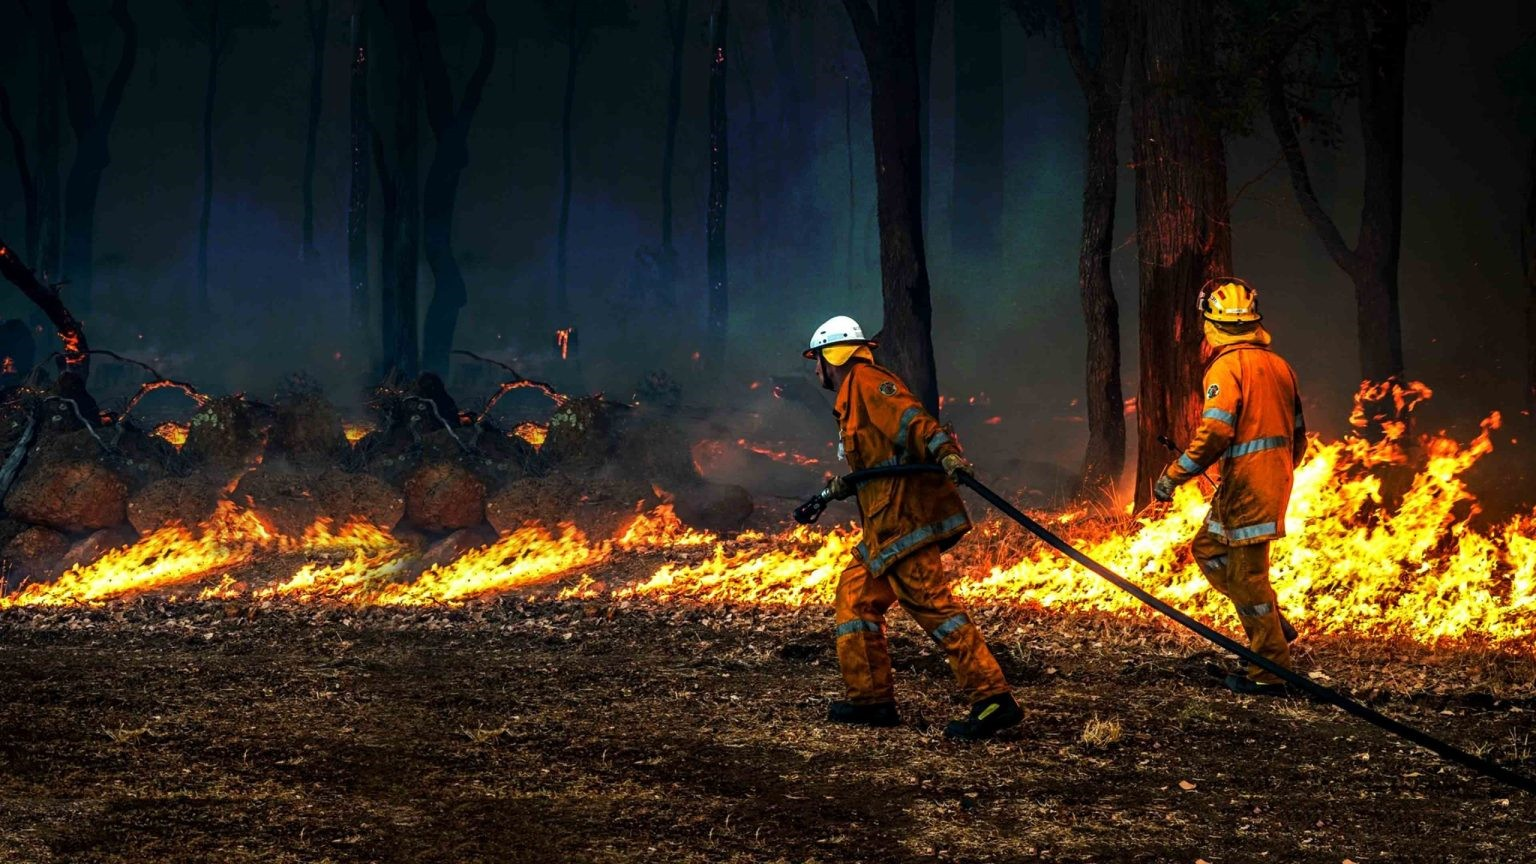 Firefighters fighting a blaze